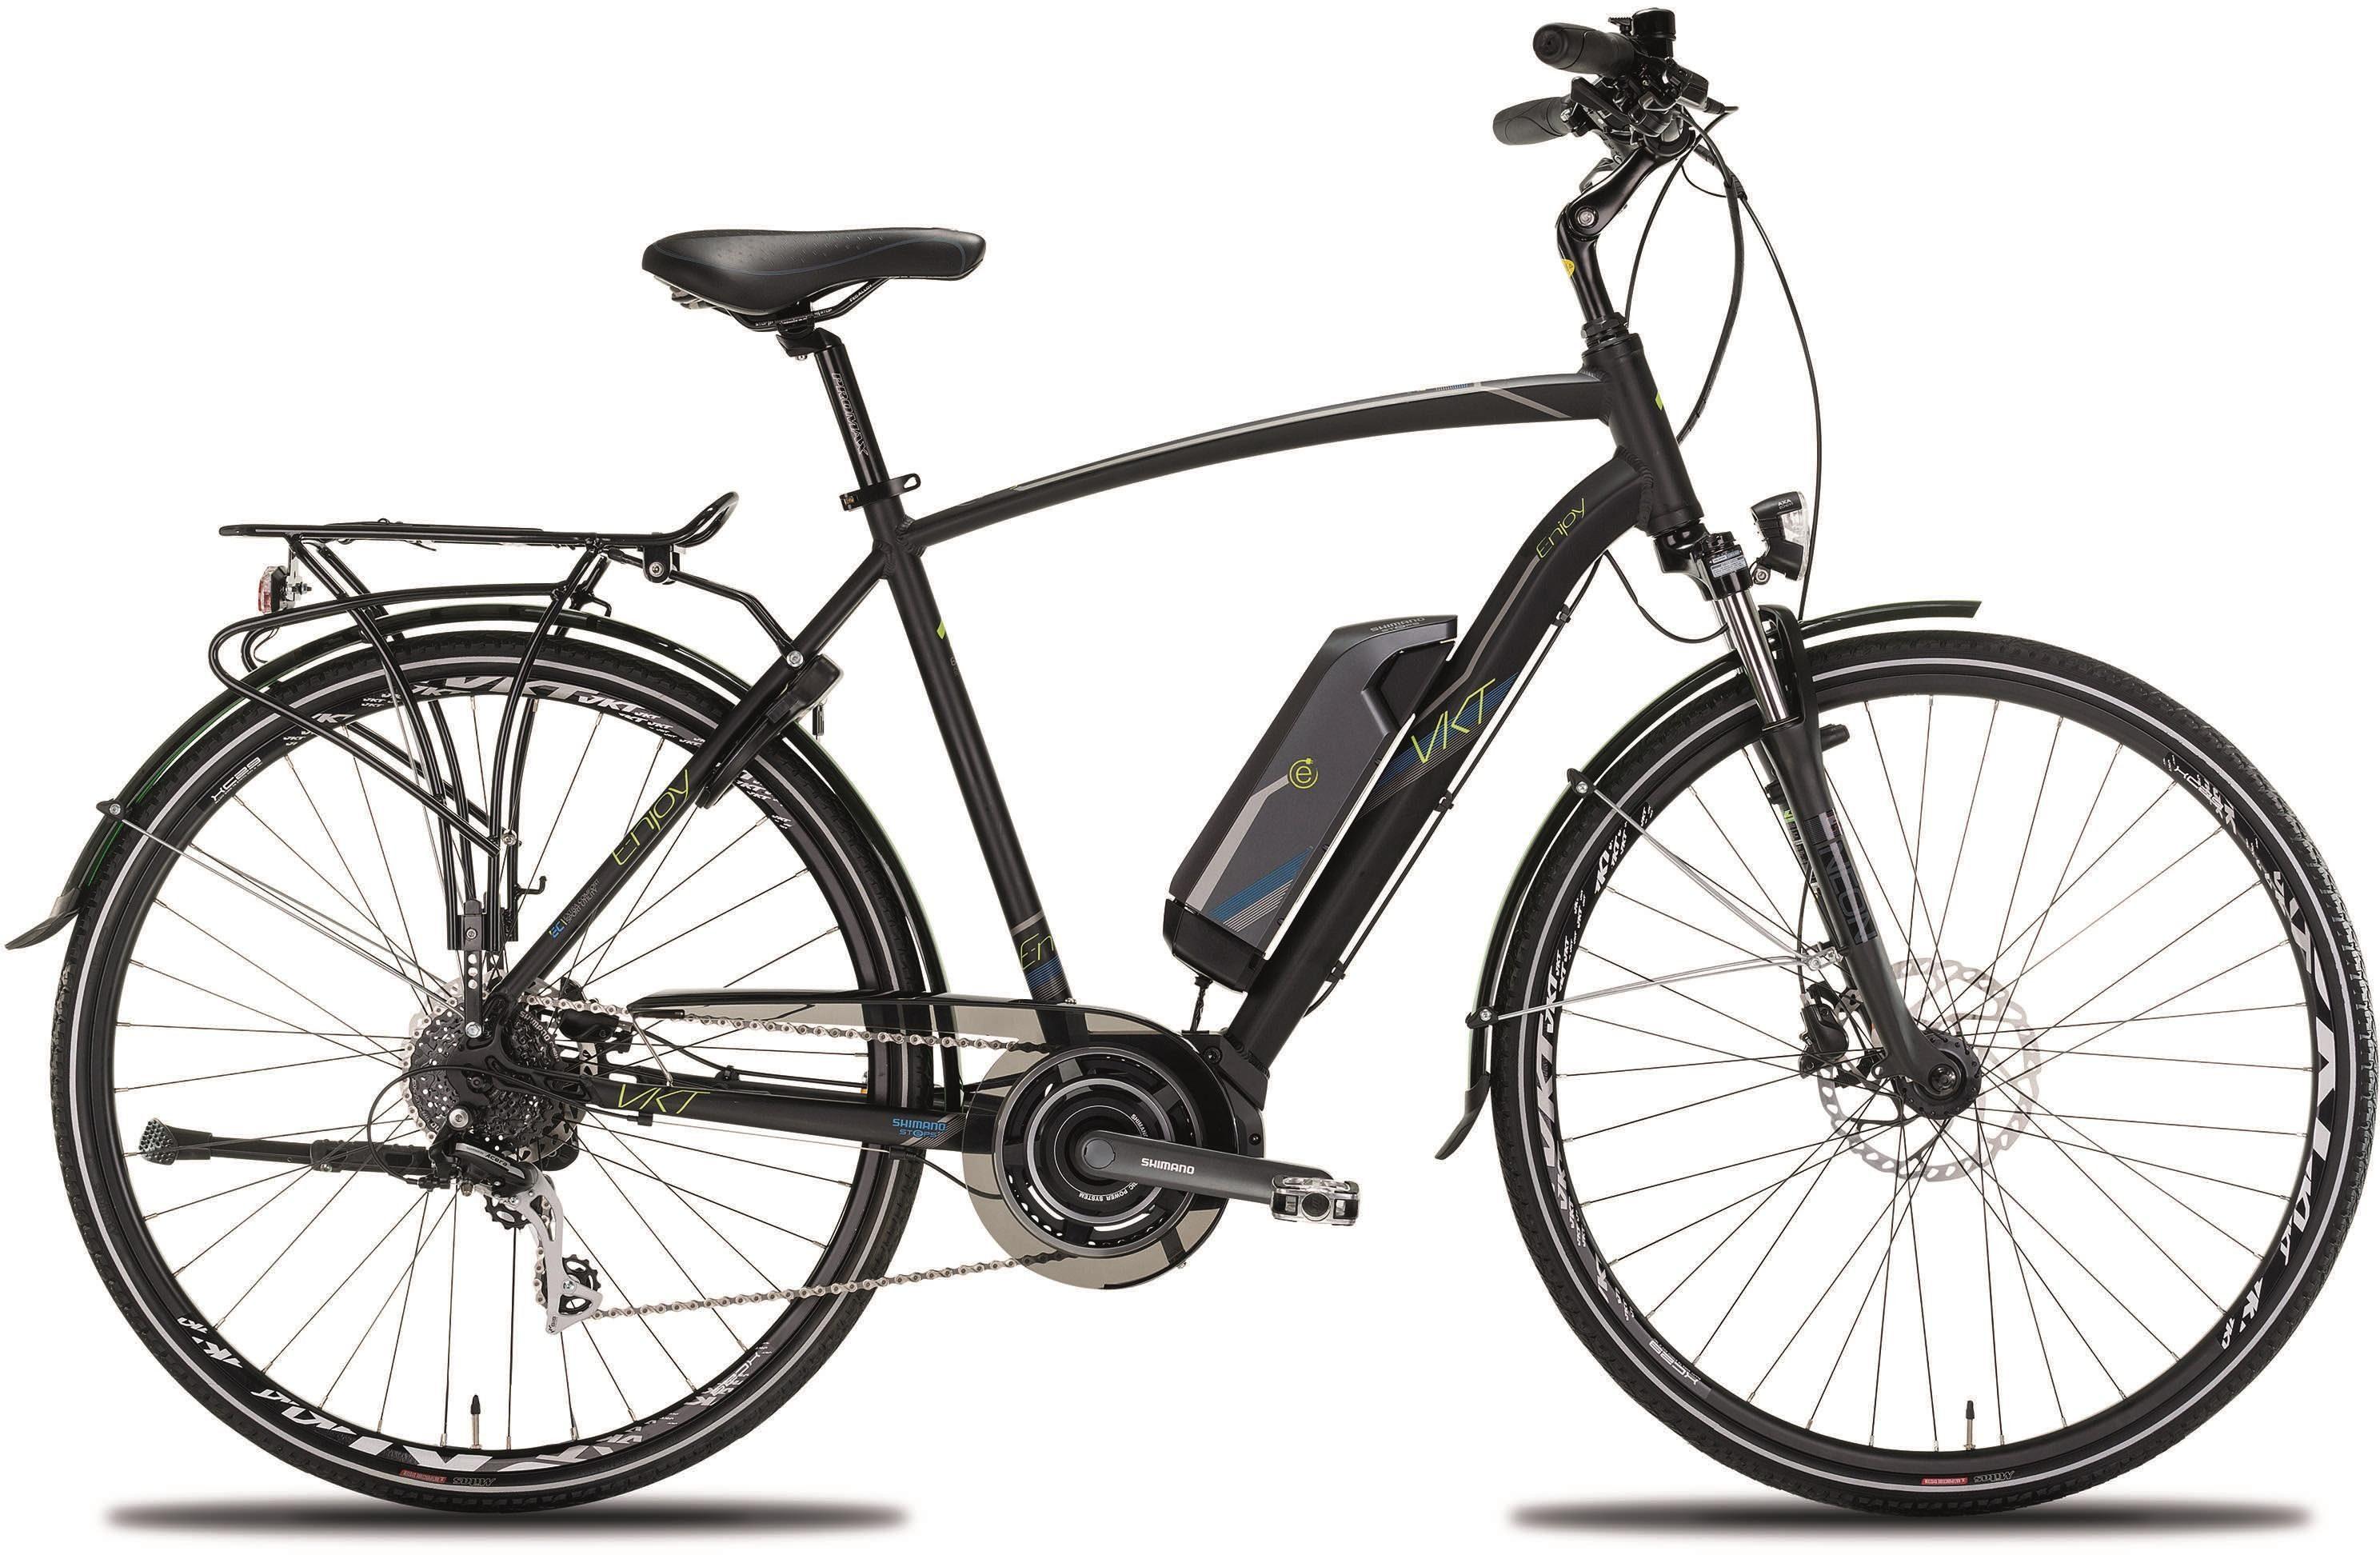 Montana Fahrräder E-Bike »N6000 ENJOY«, 8 Gang Shimano Shimano Acera M-360 Schaltwerk, Kettenschaltung, Mittelmotor 250 W